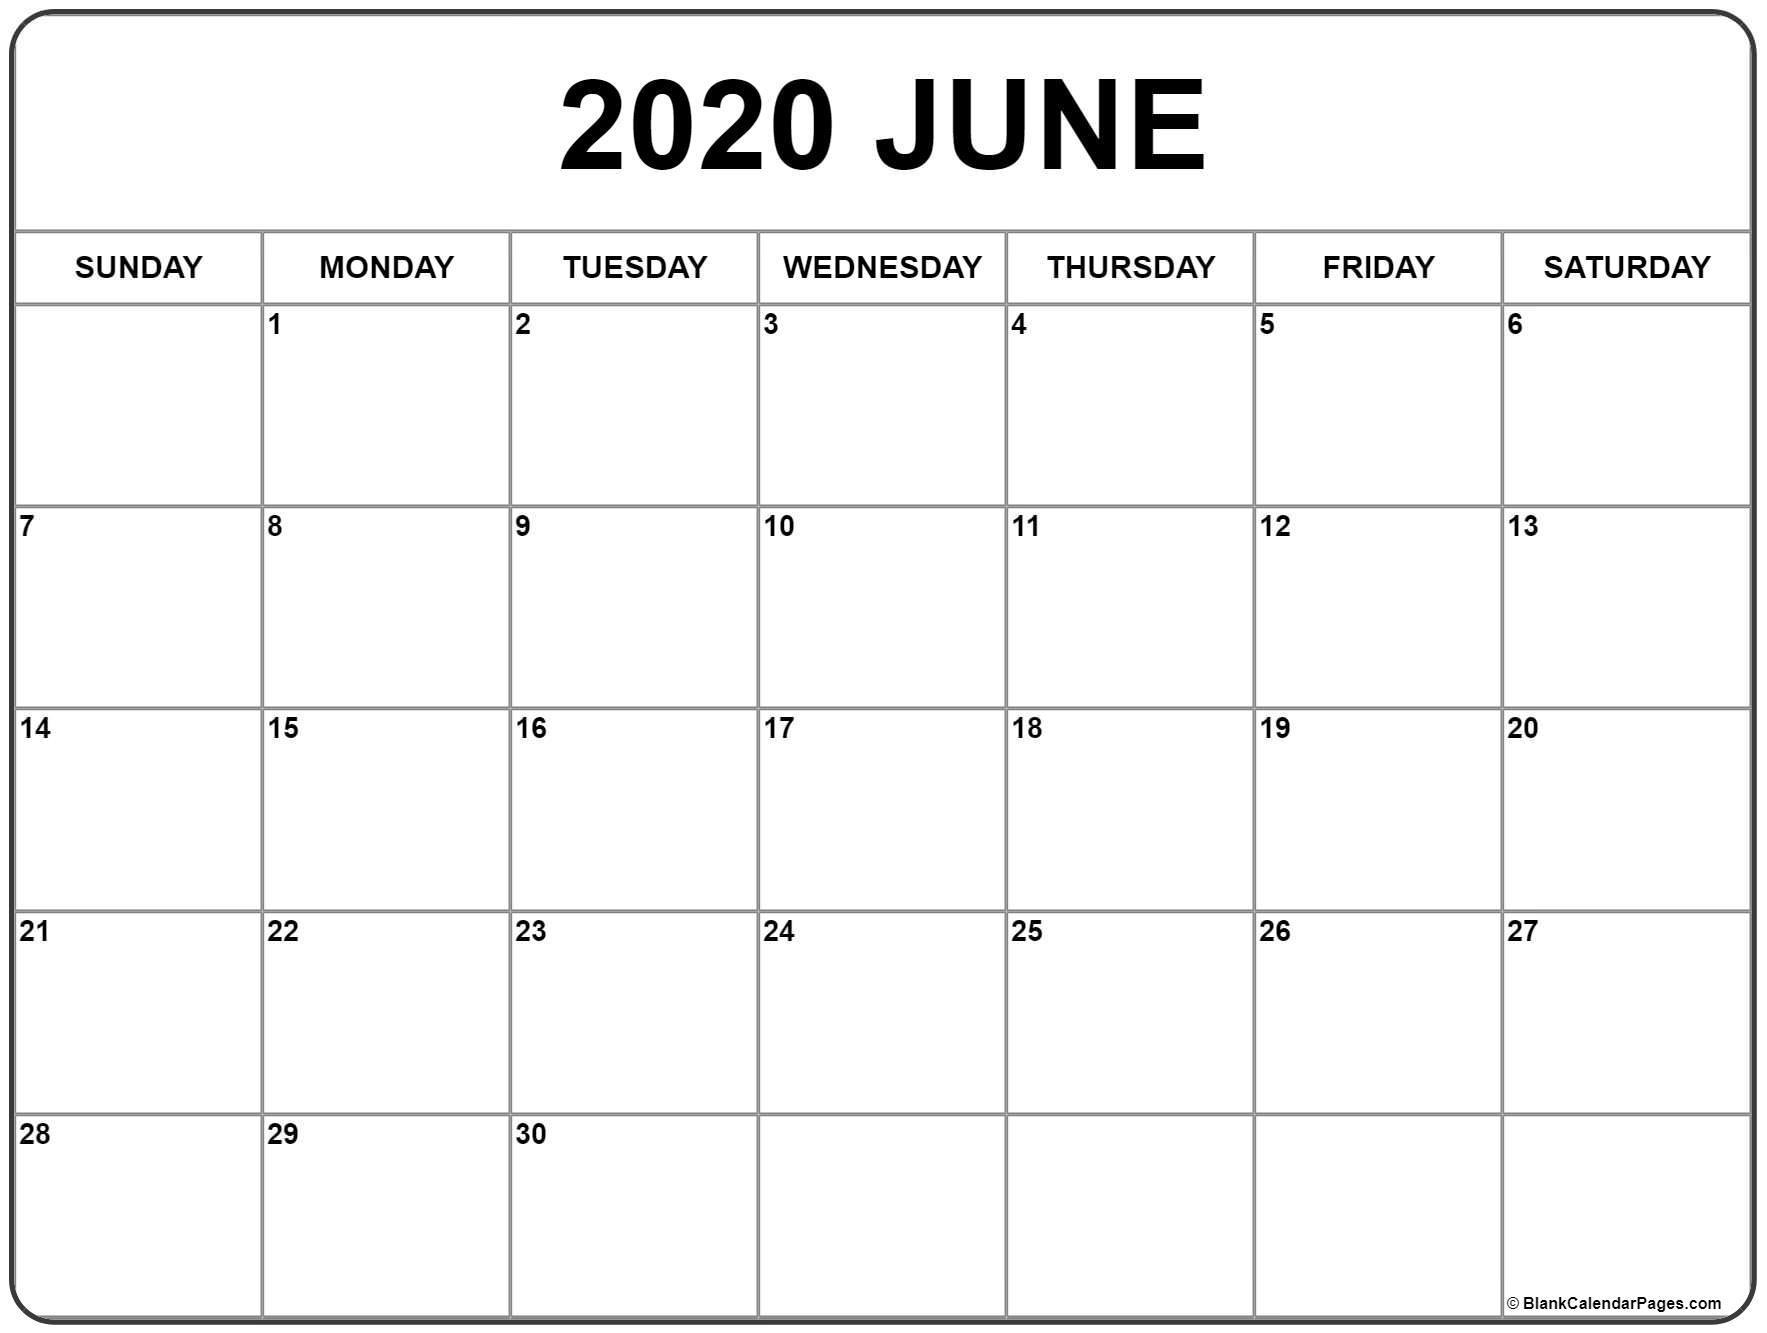 June 2020 Calendar | Free Printable Monthly Calendars throughout Free Printed Calendars From June 2019 To June 2020